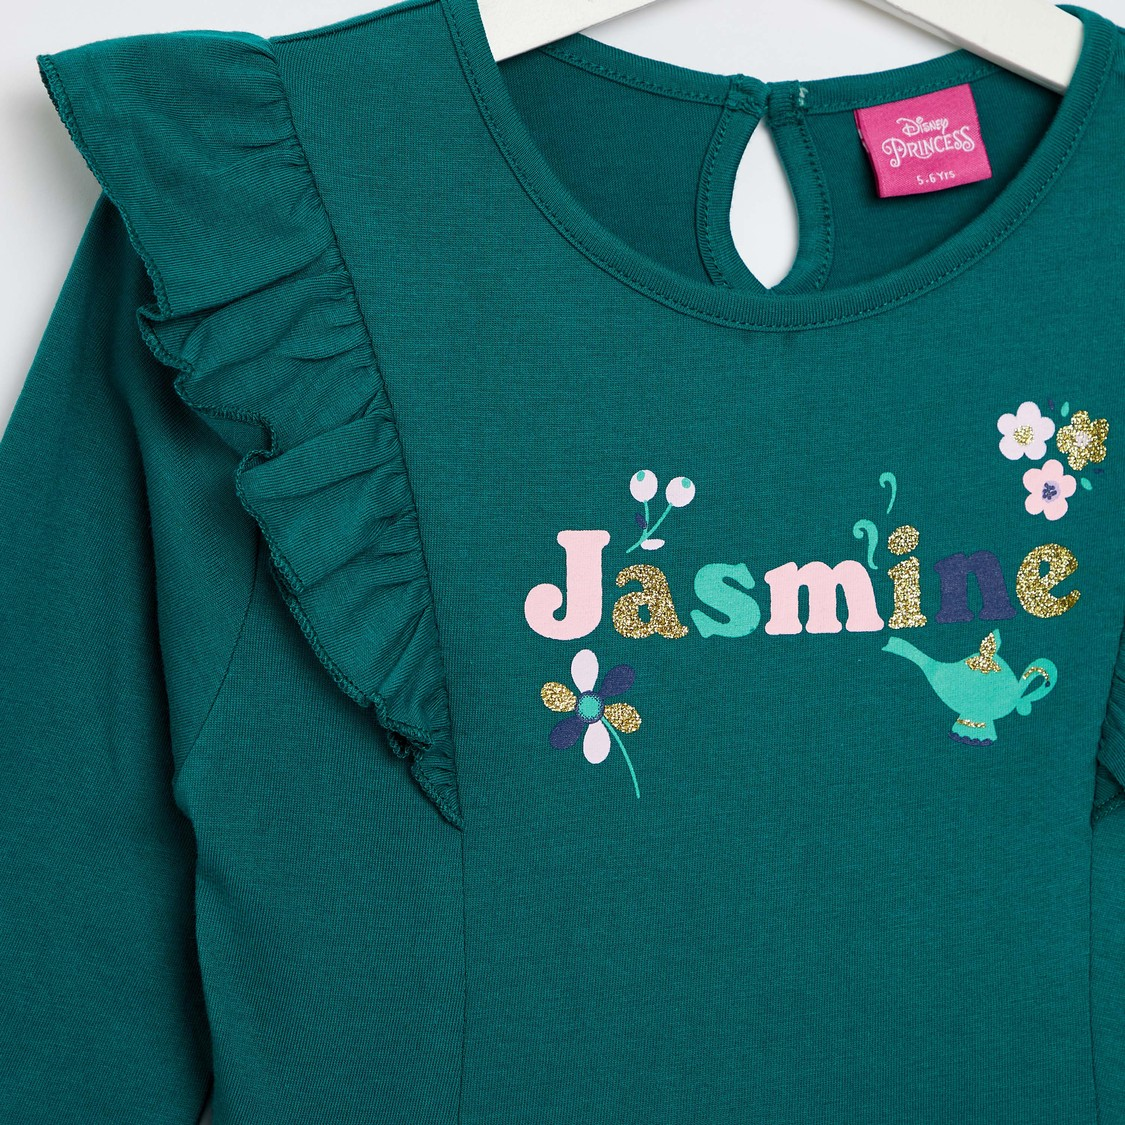 Jasmine Print Round Neck Knee Length Dress with Long Sleeves